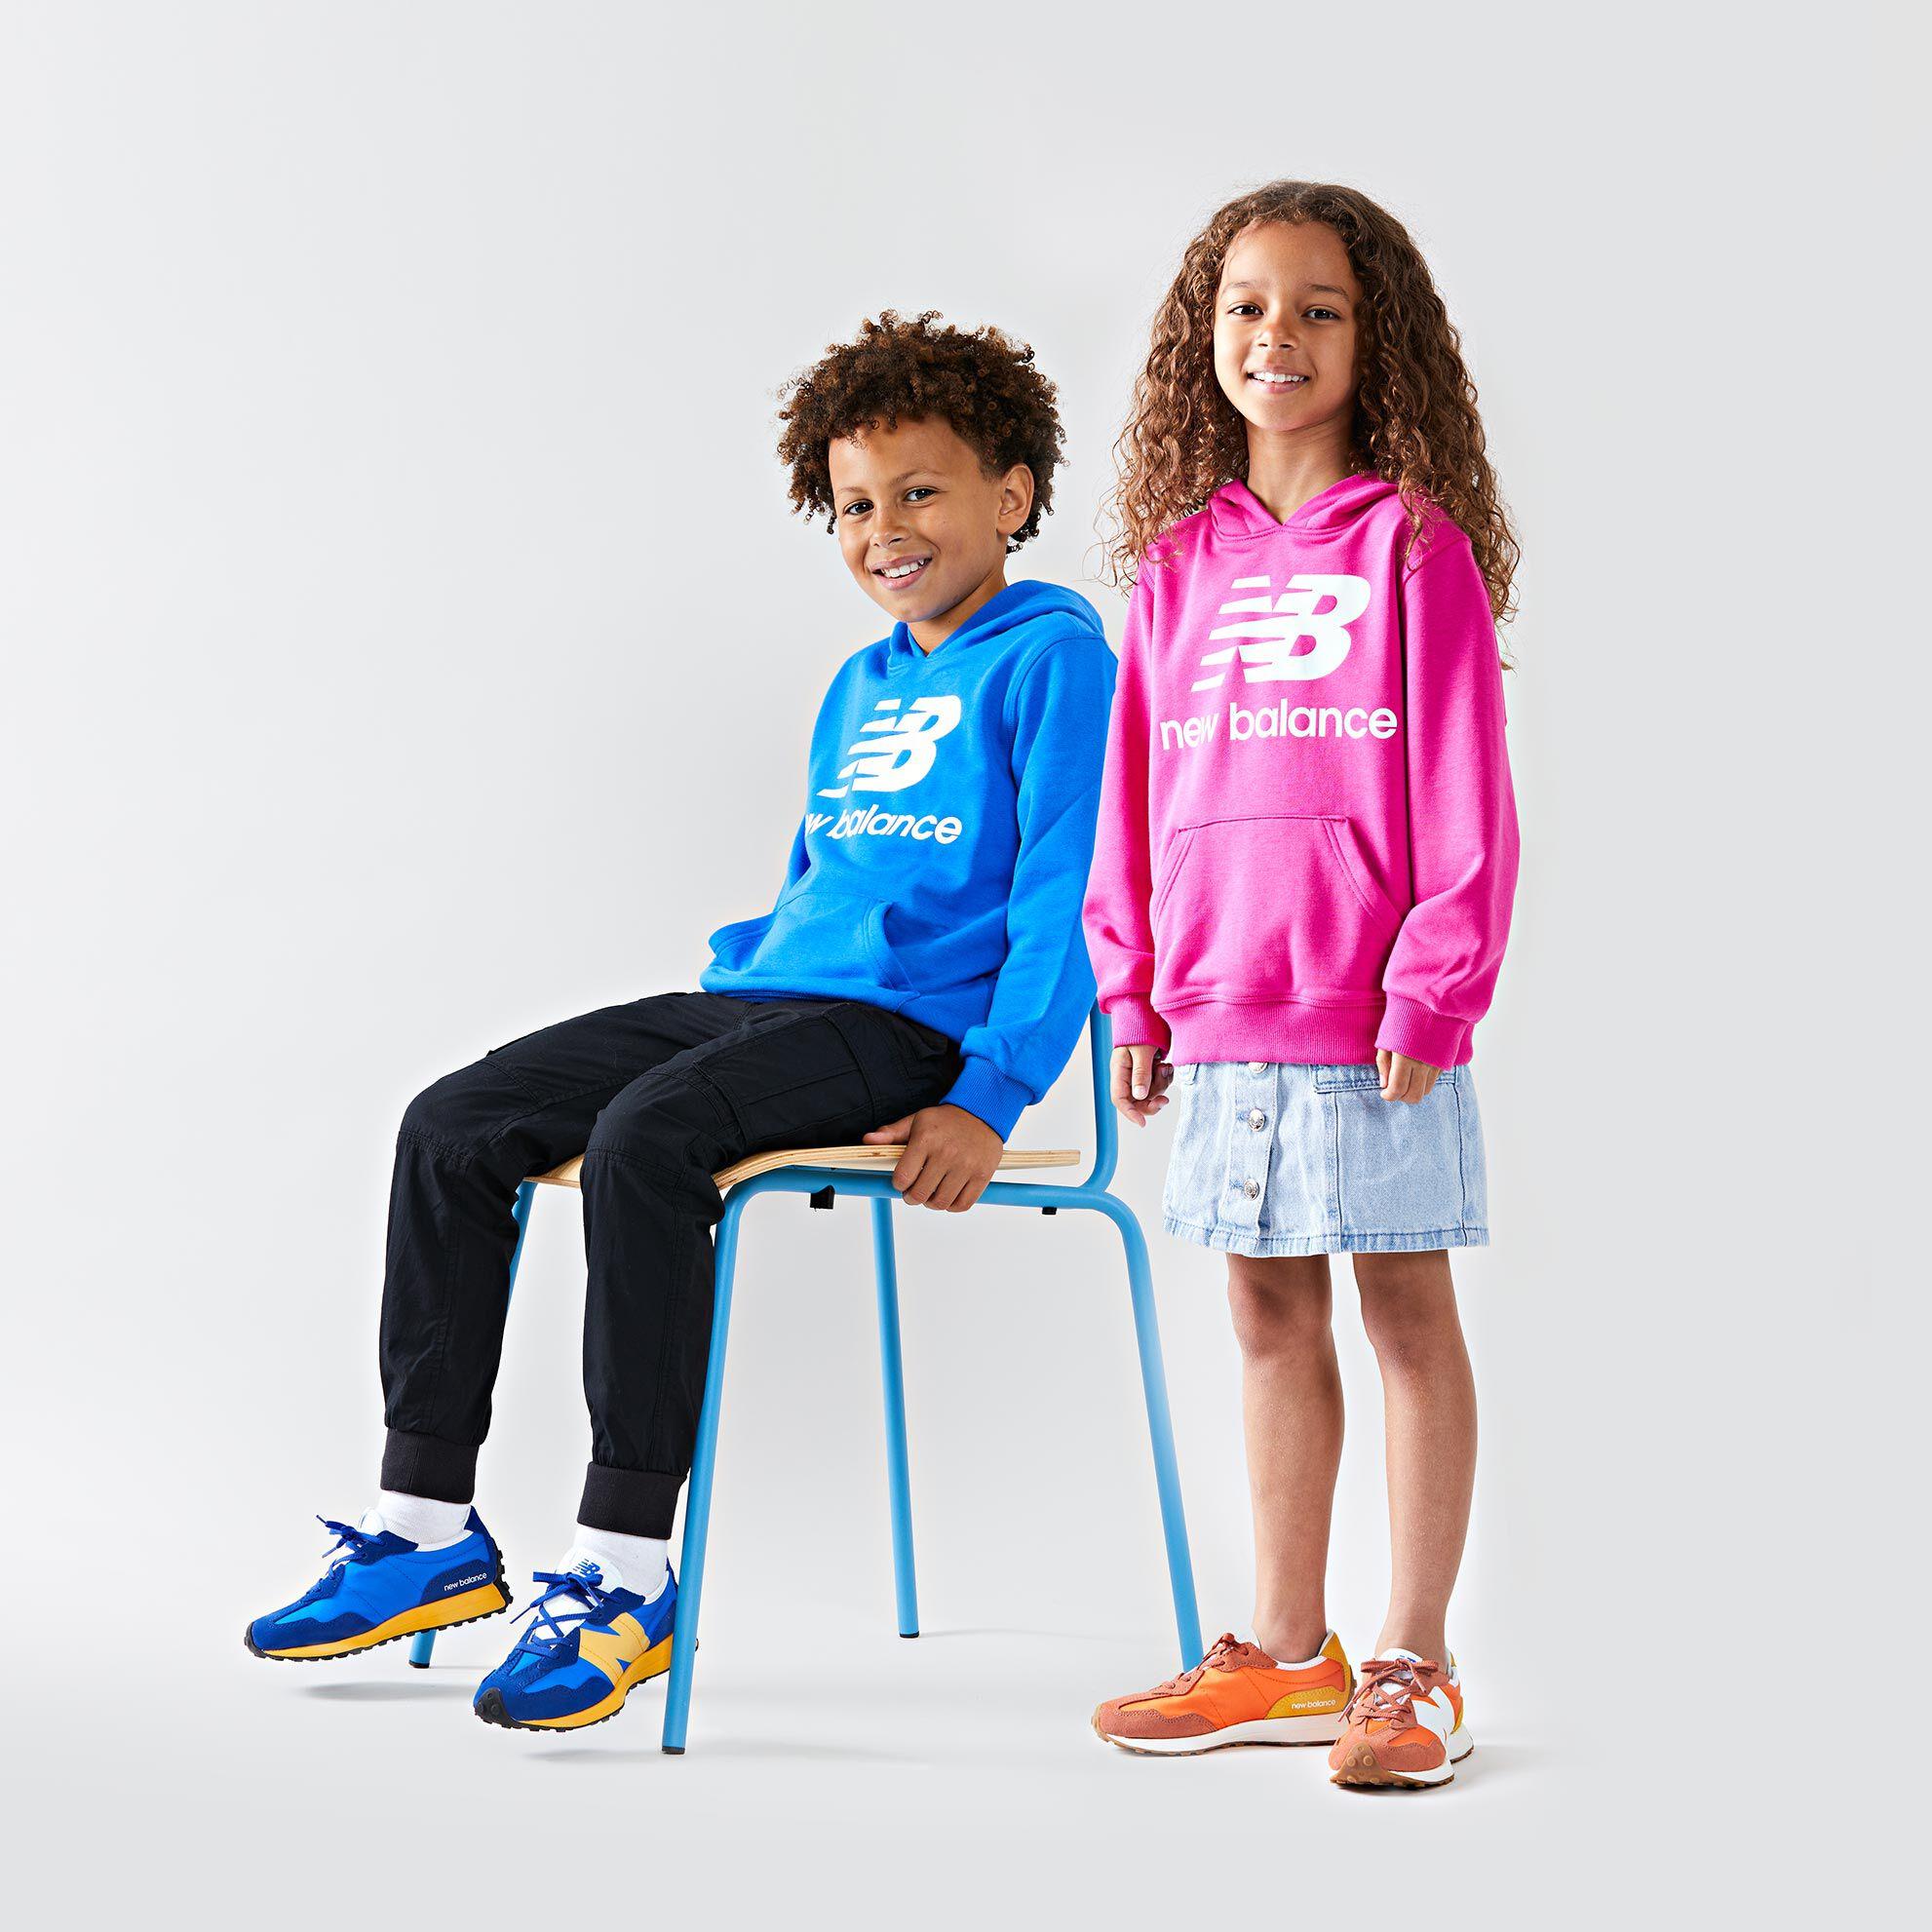 Kids' Shoes & Sport Accessories - New Balance